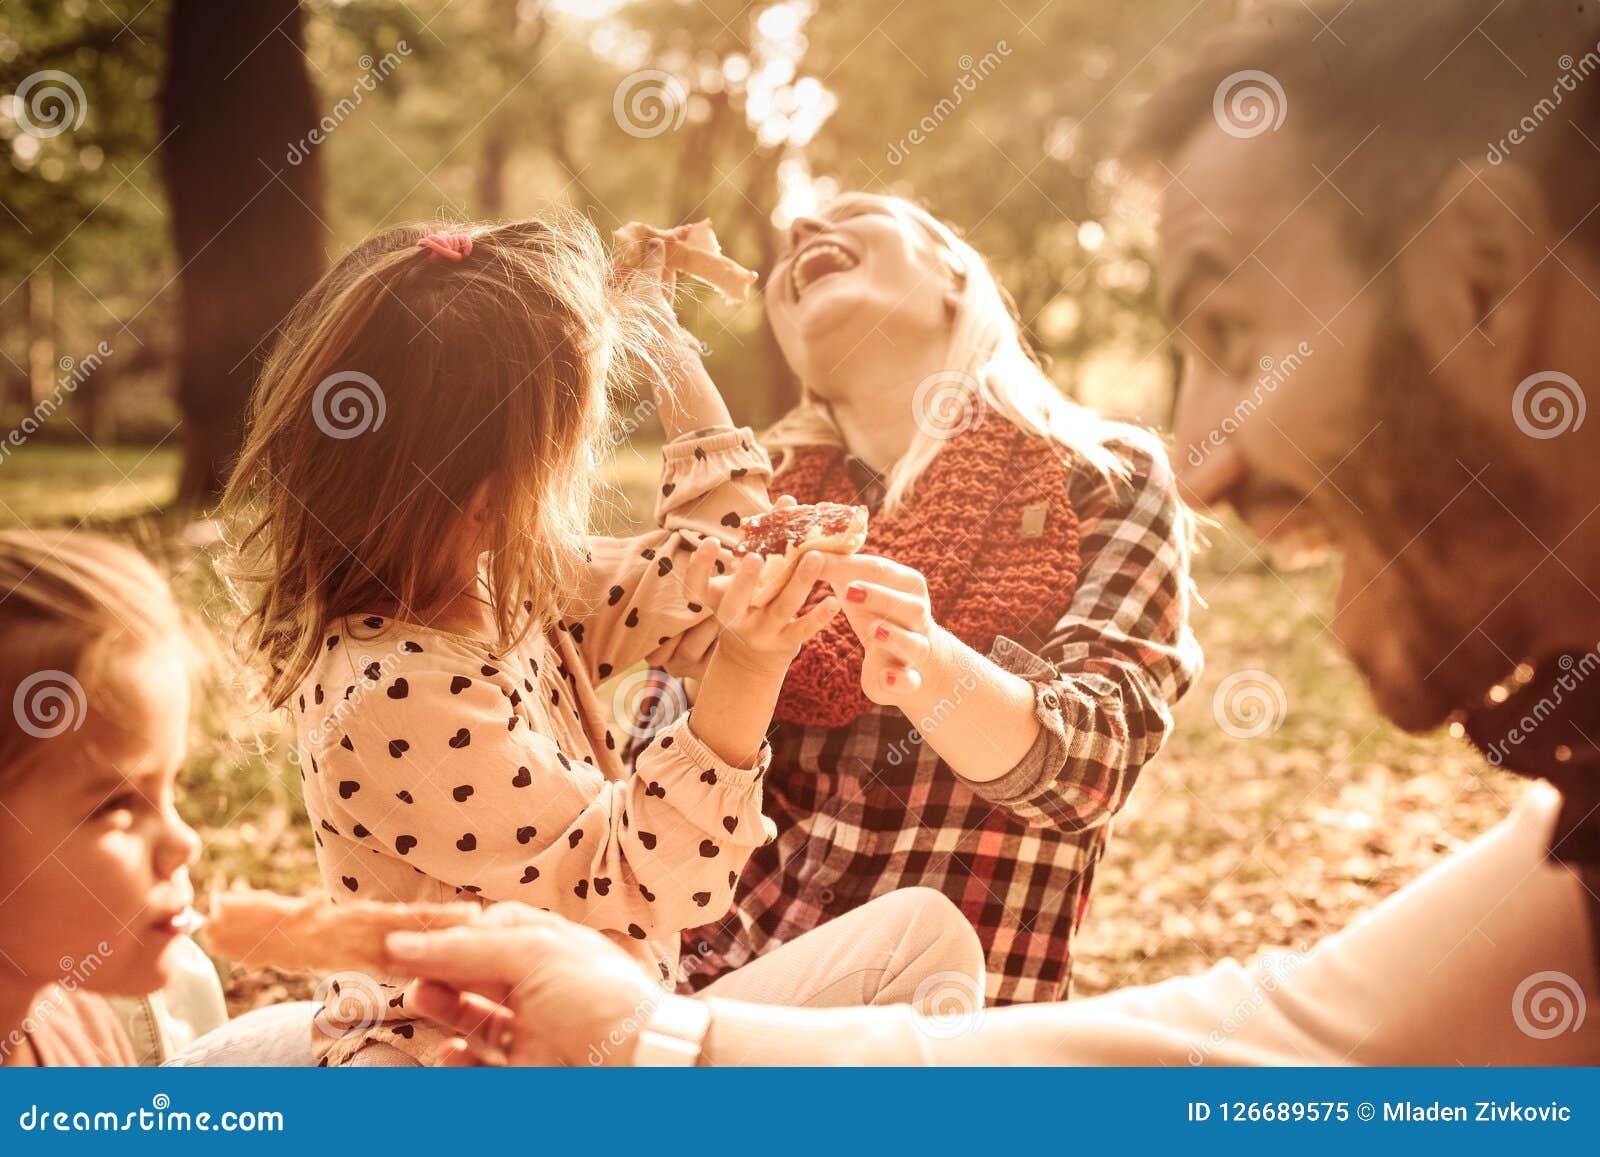 Familienpicknick ist immer Spaß